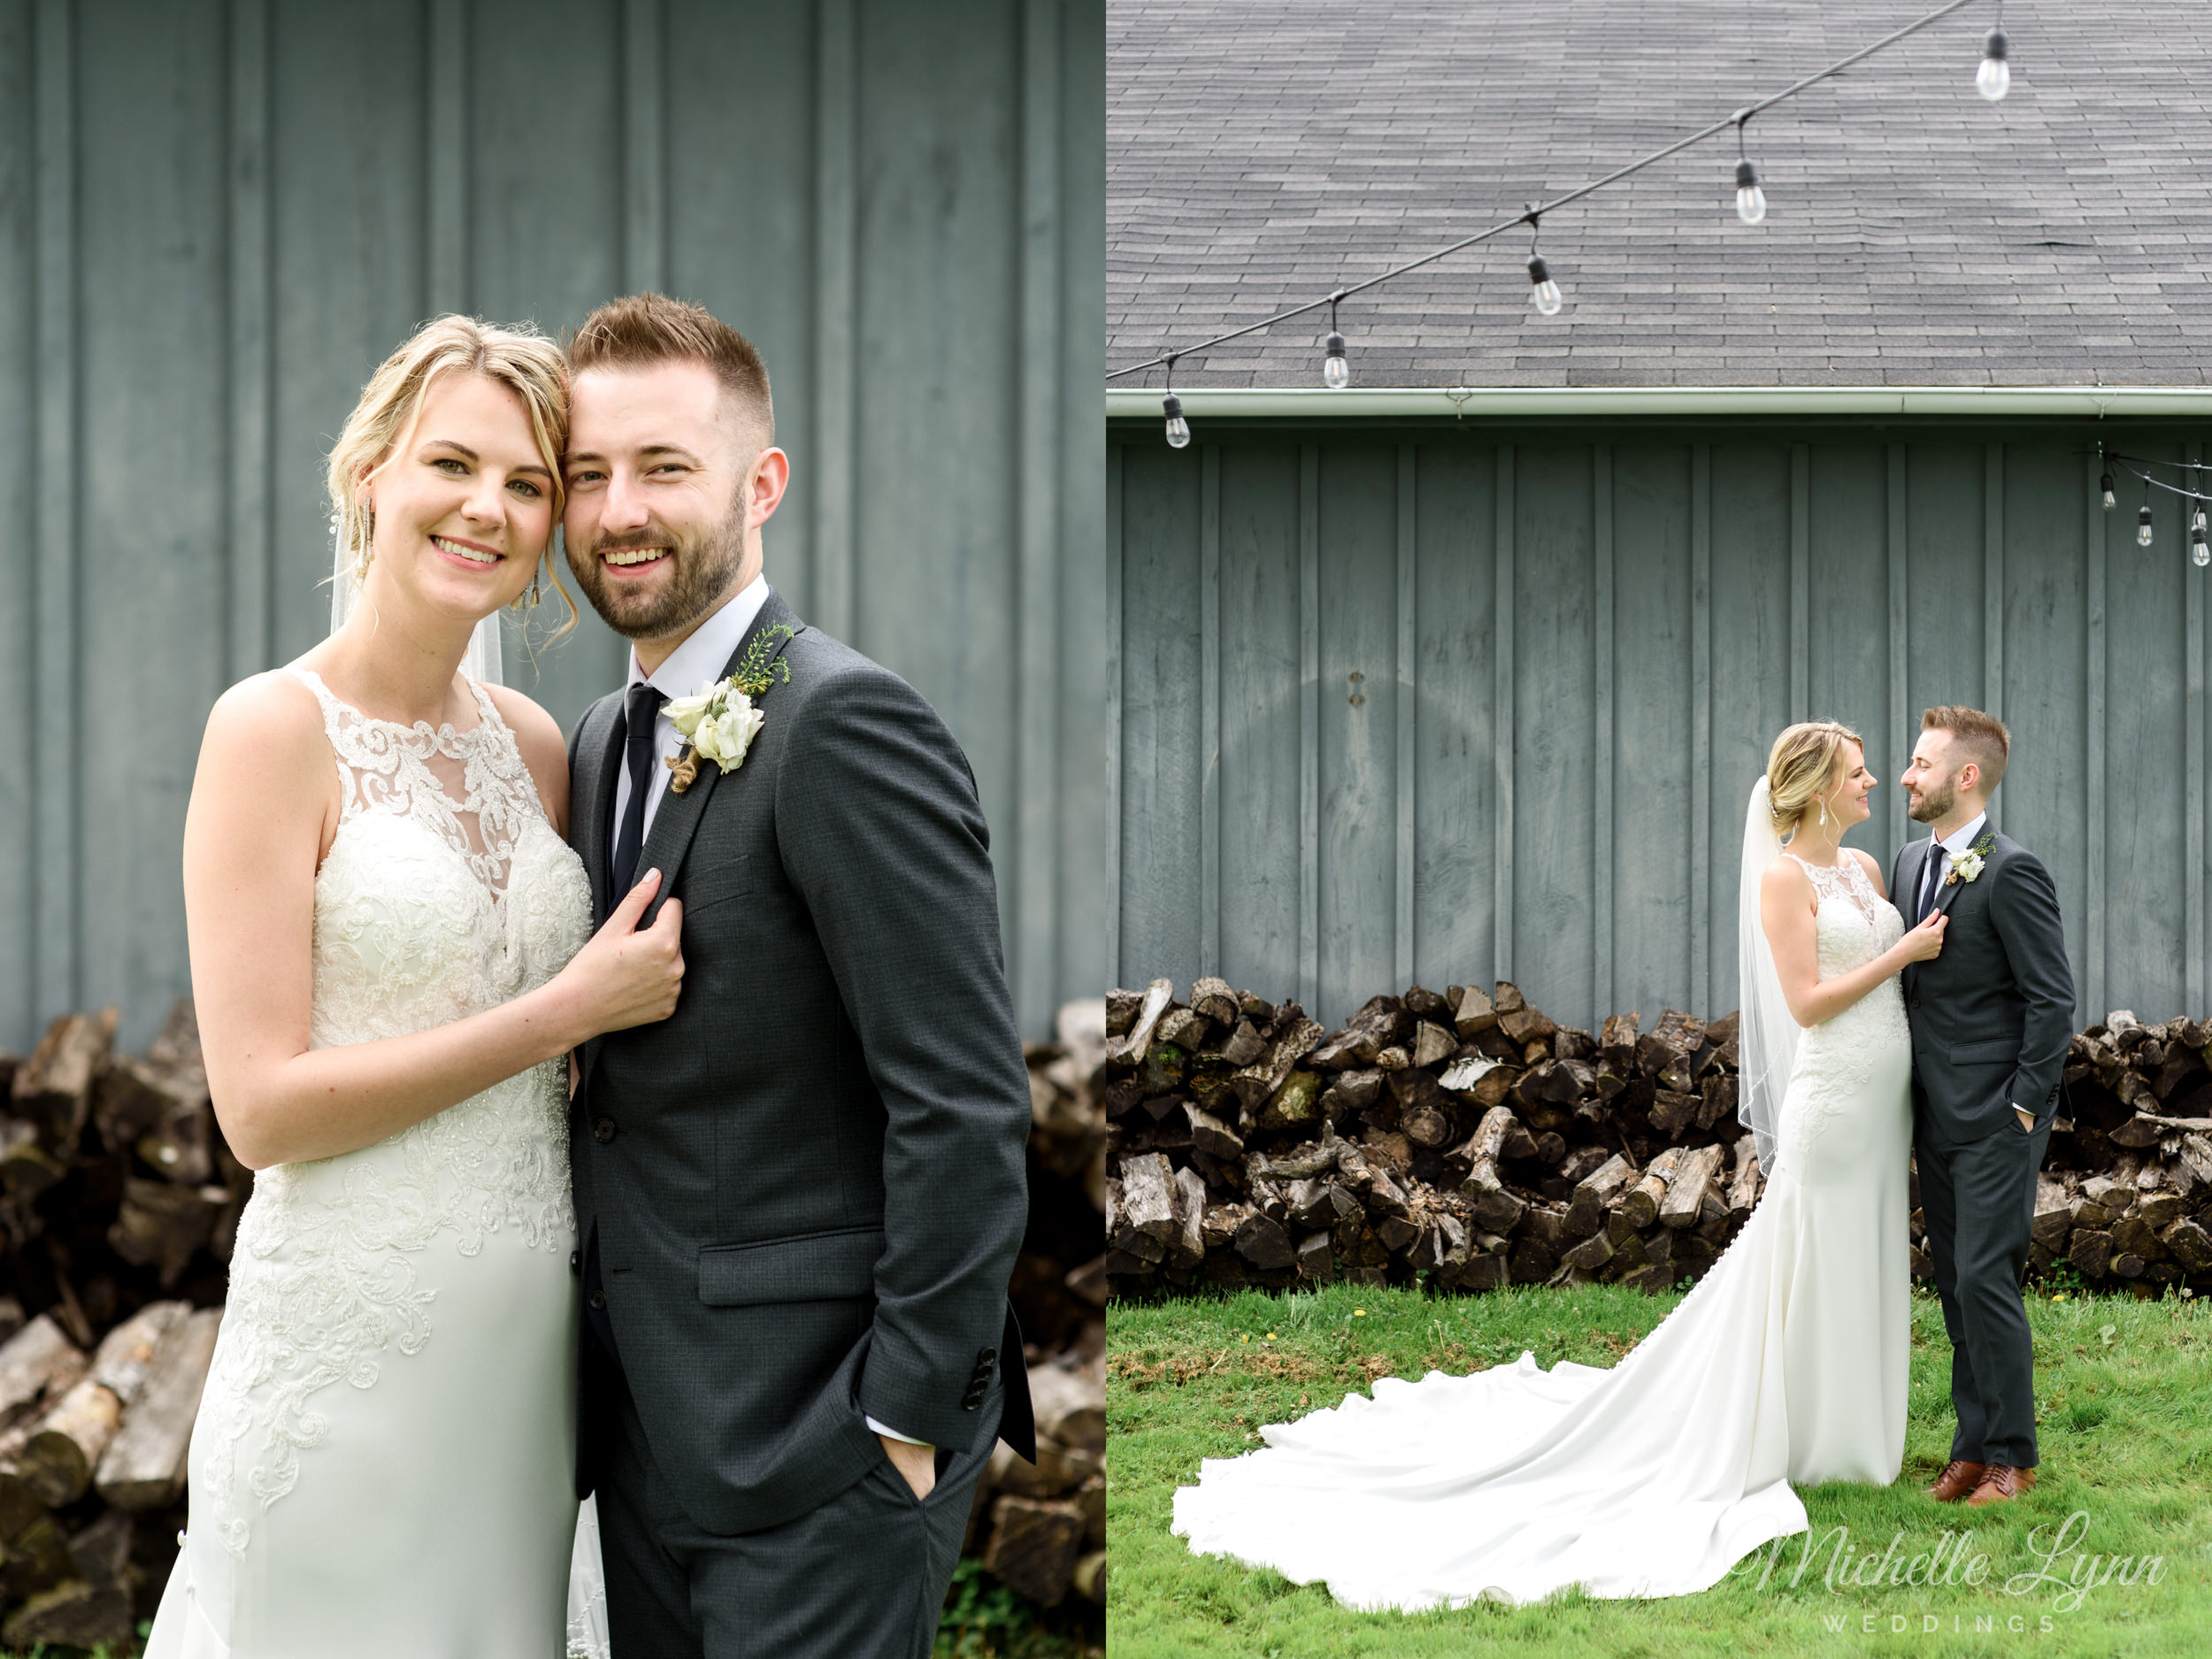 mlw-the-farm-bakery-and-events-wedding-photos-51.jpg